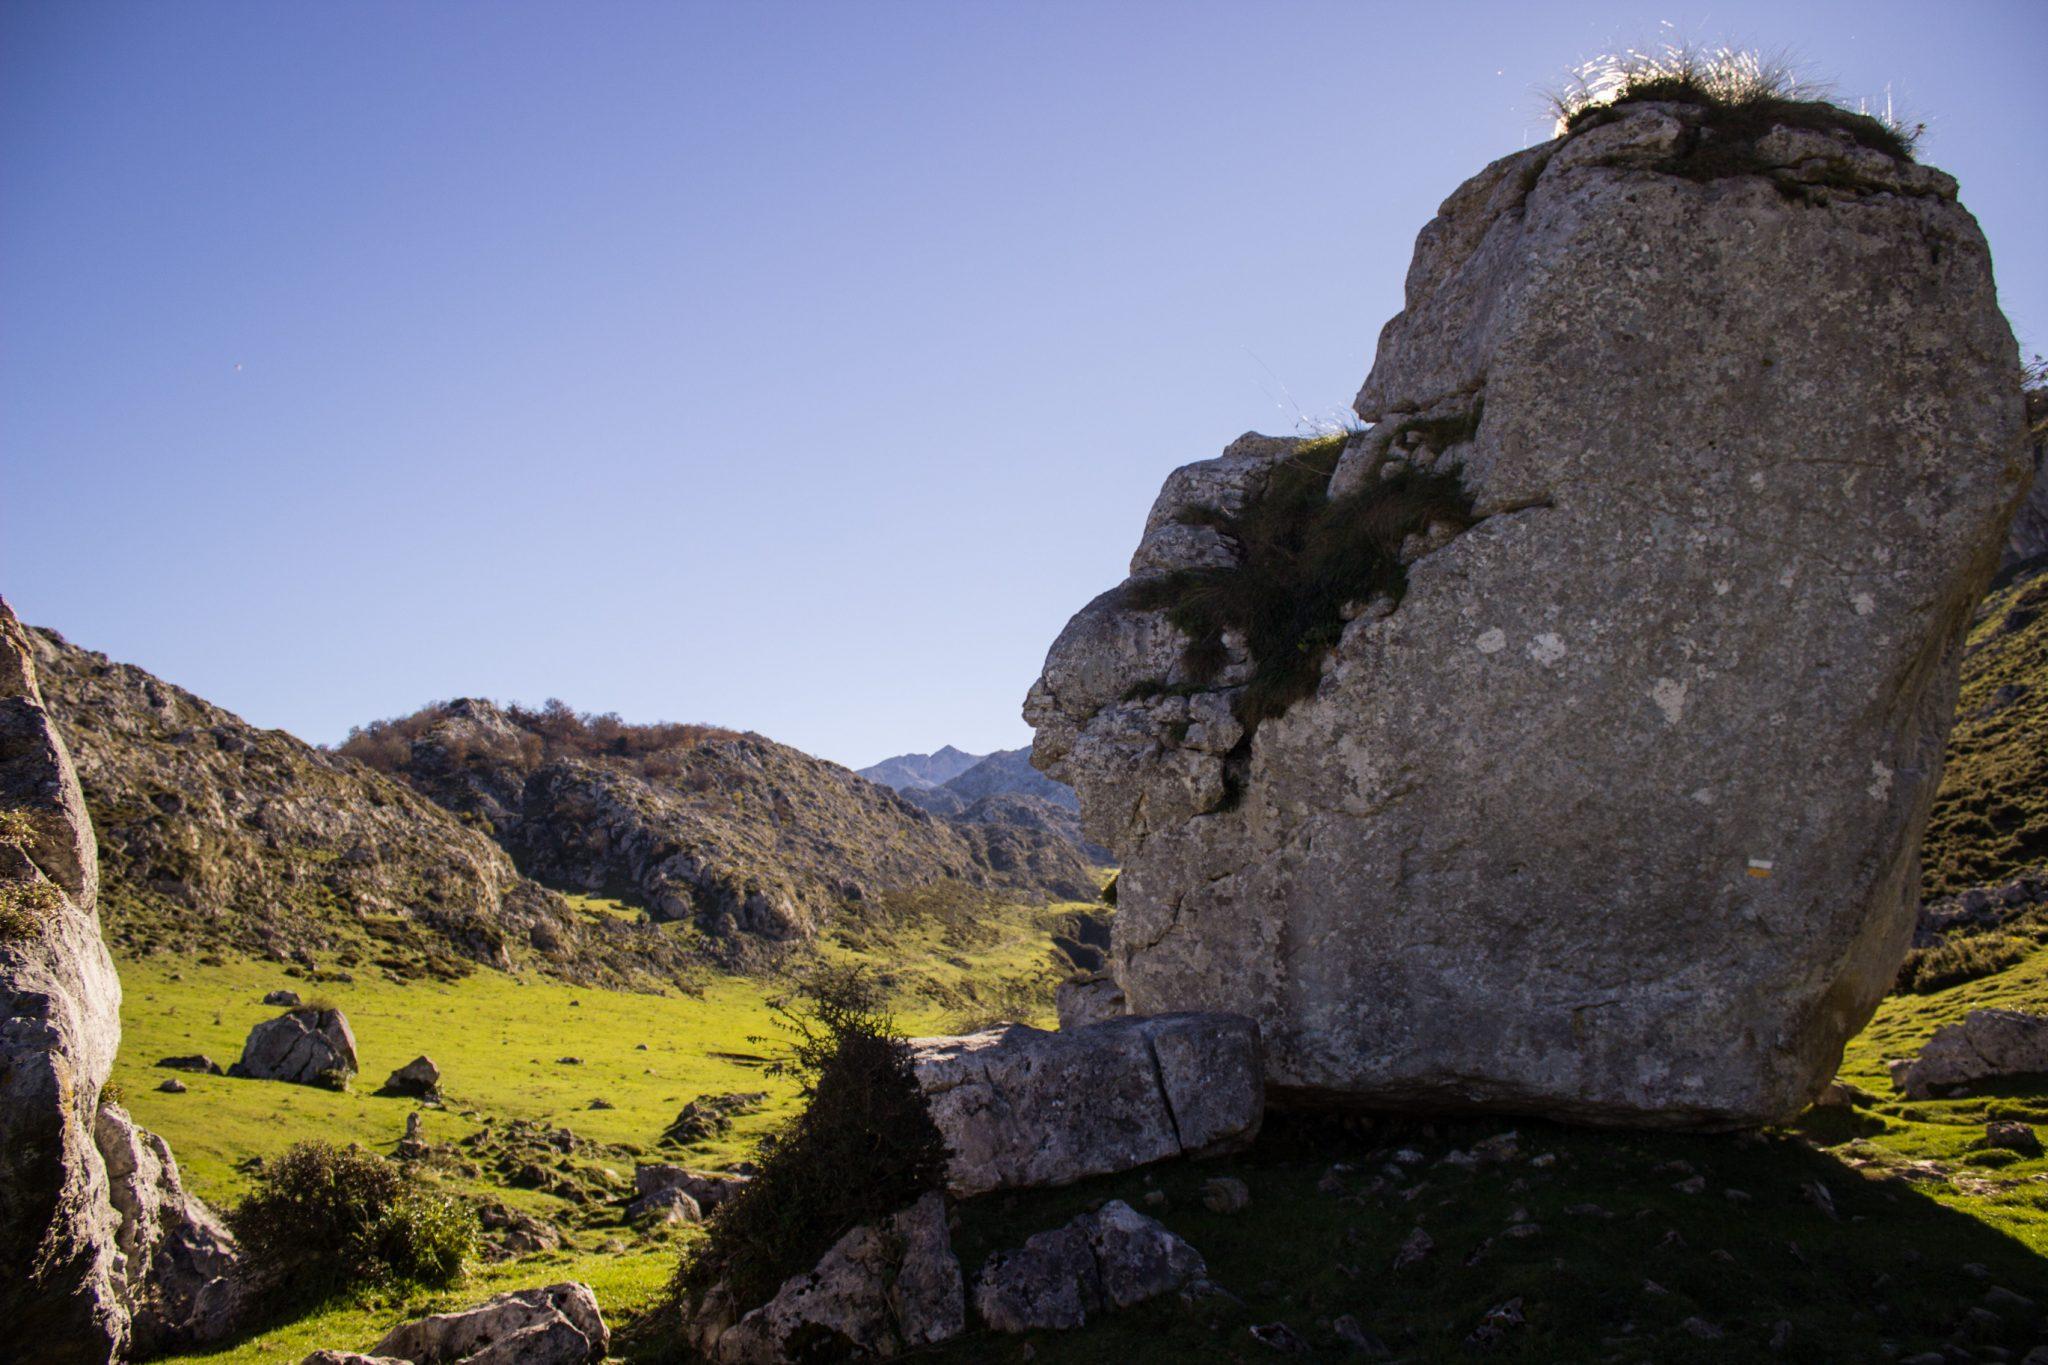 Wanderung Mirador de Ordiales Picos de Europa Spanien, Felsen, großer Findling, Sonnenschein